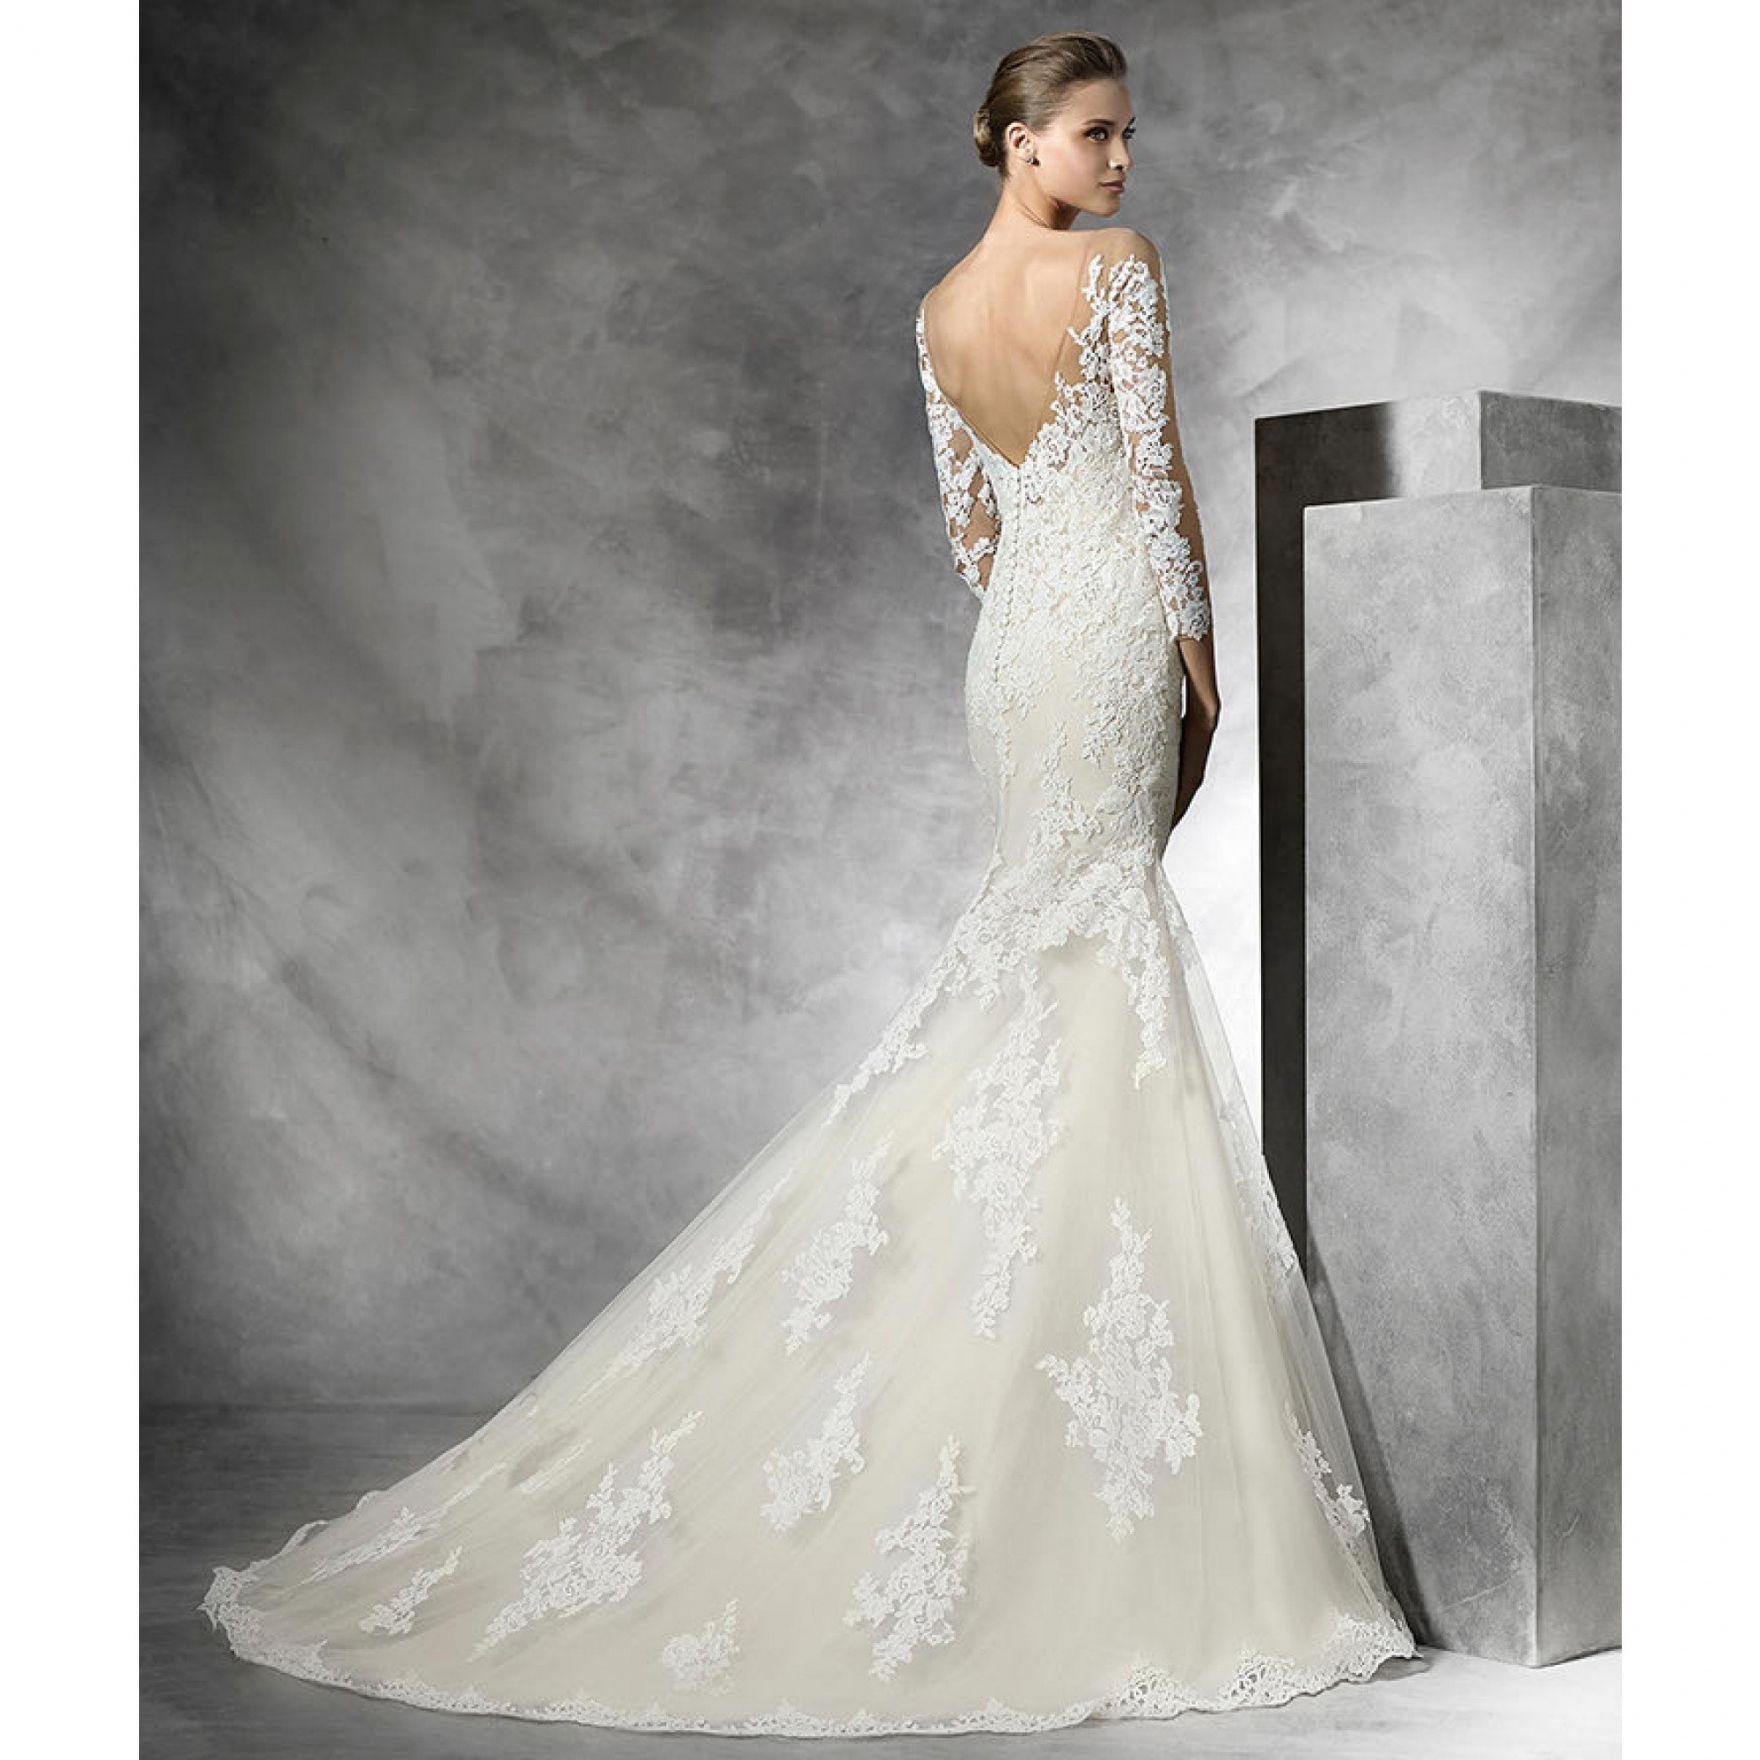 100+ Free Wedding Dress Catalog - Dressy Dresses for Weddings Check ...